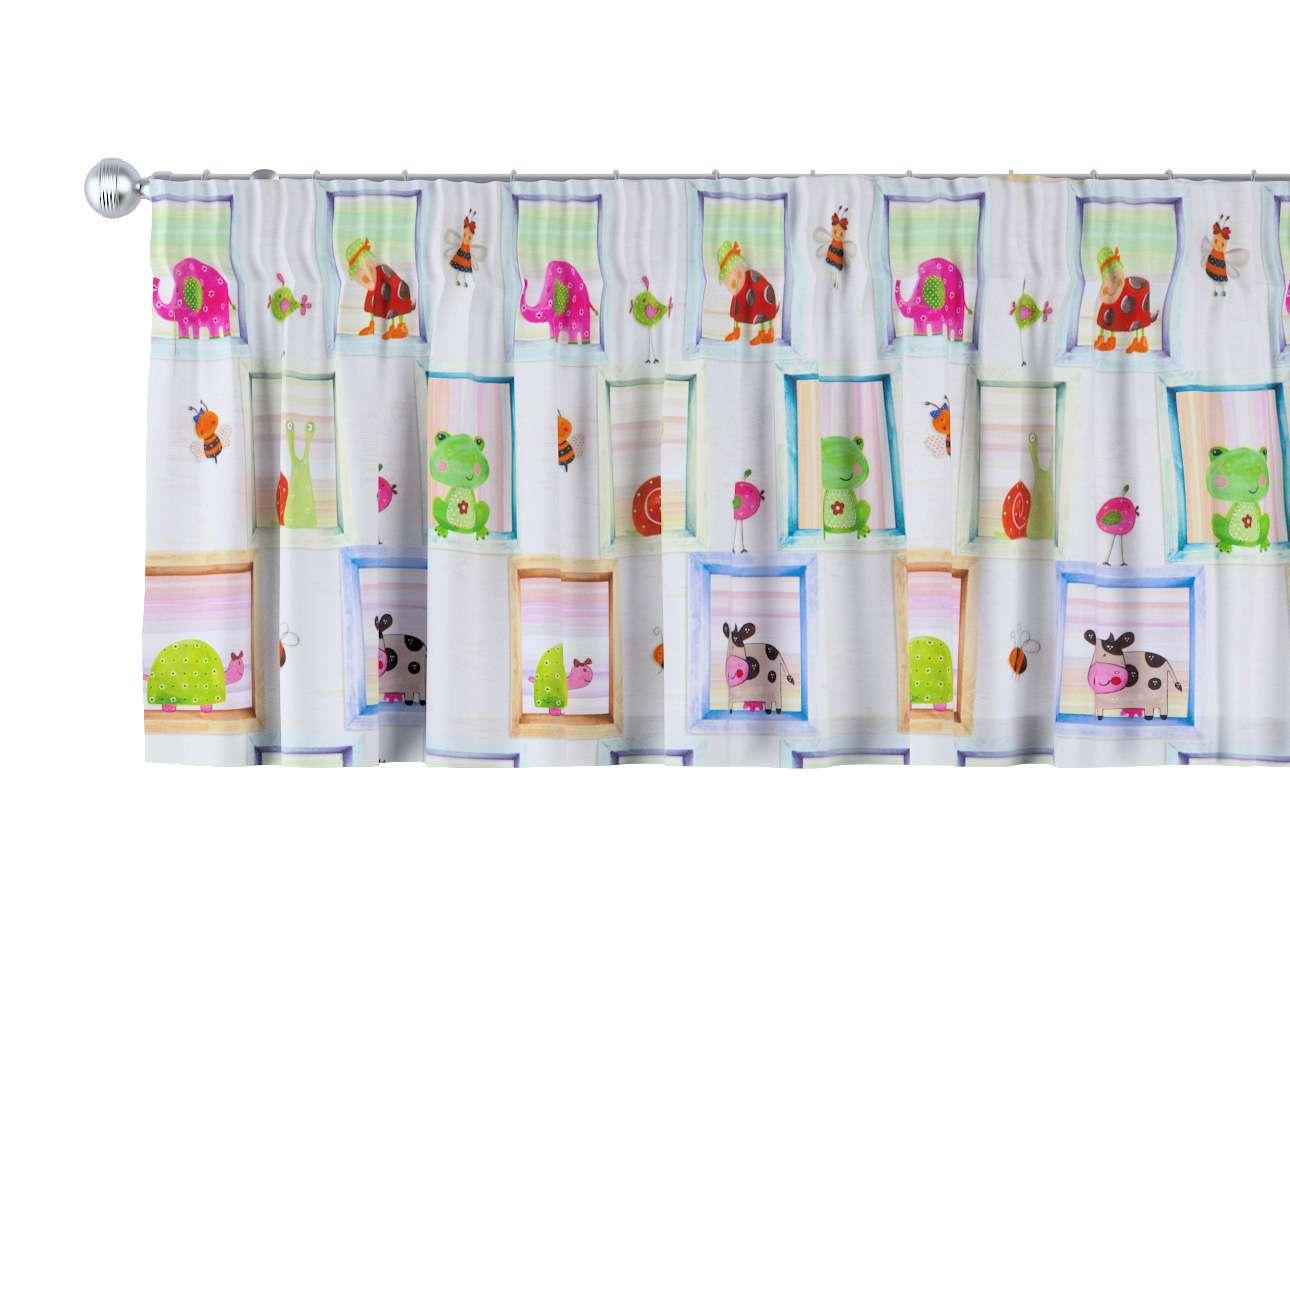 Pencil pleat pelmet 130 x 40 cm (51 x 16 inch) in collection Apanona, fabric: 151-04